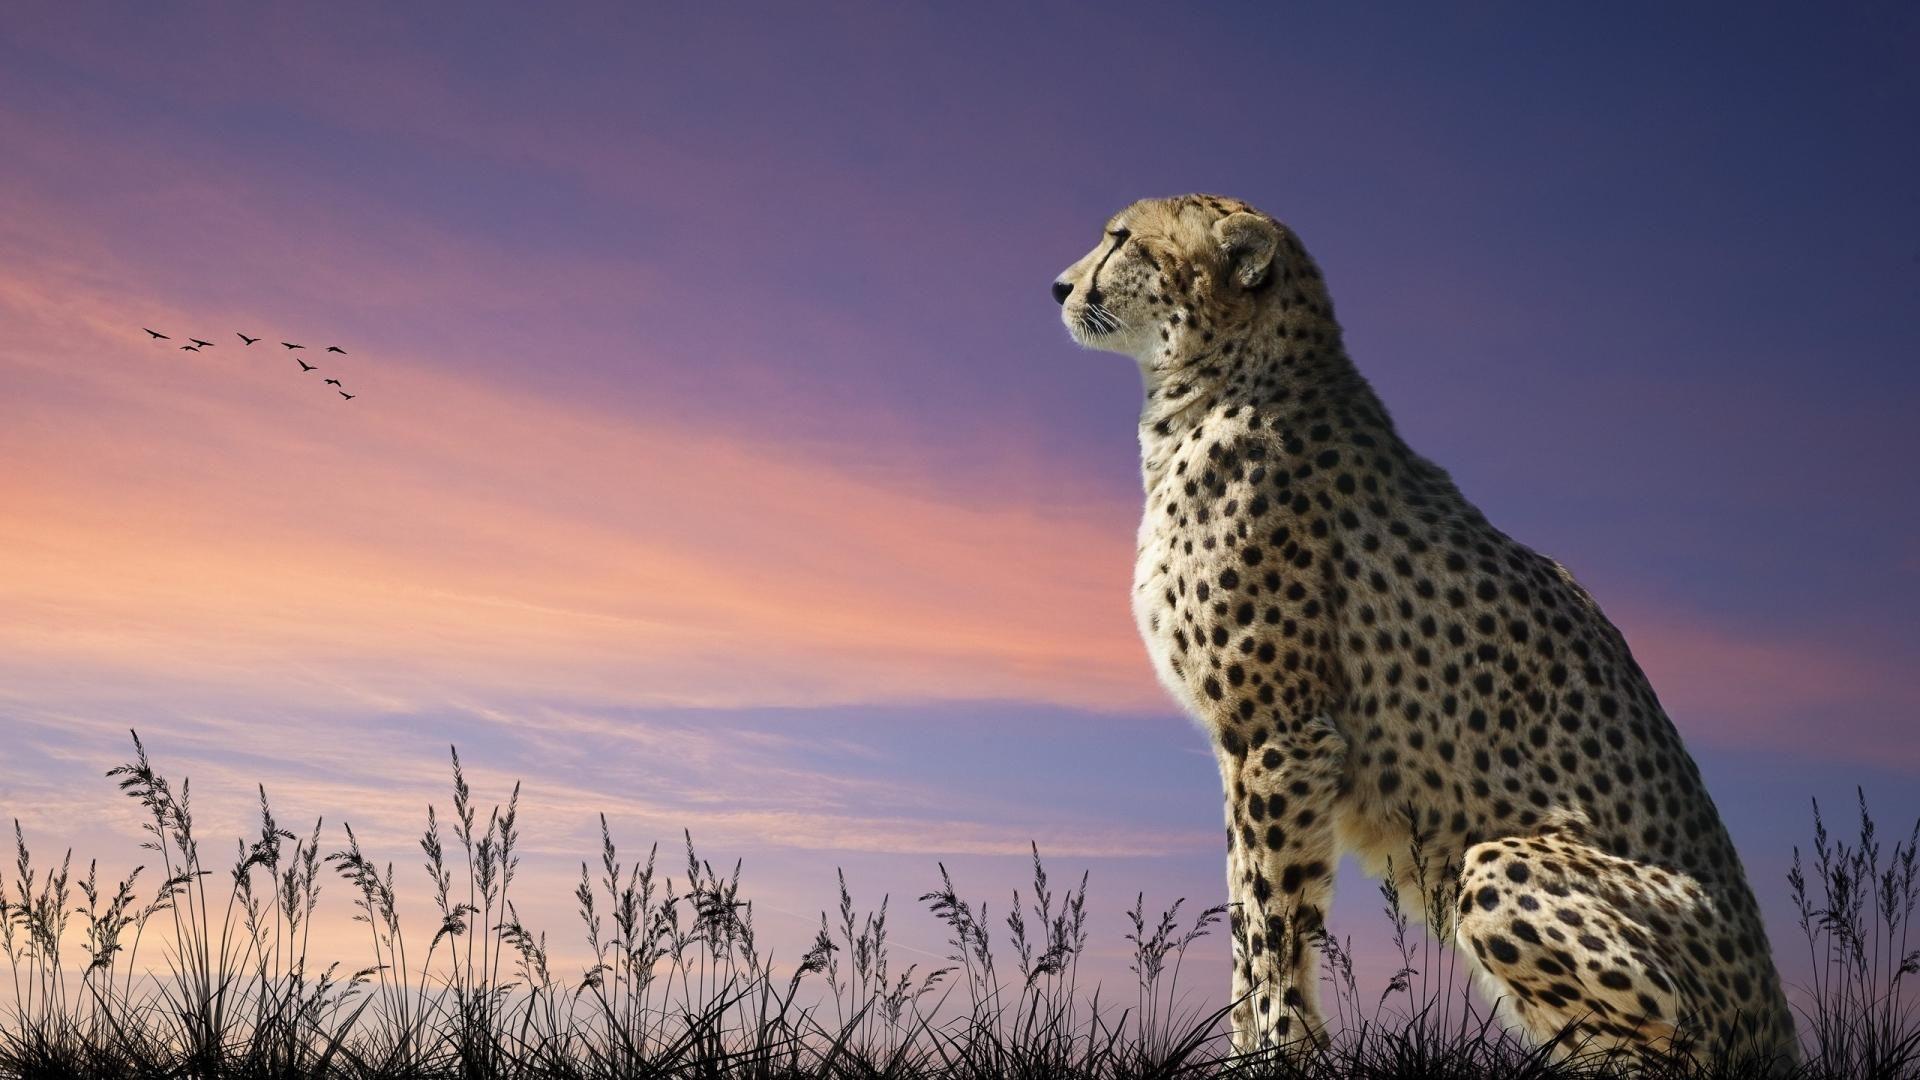 Wallpapers Cheetah